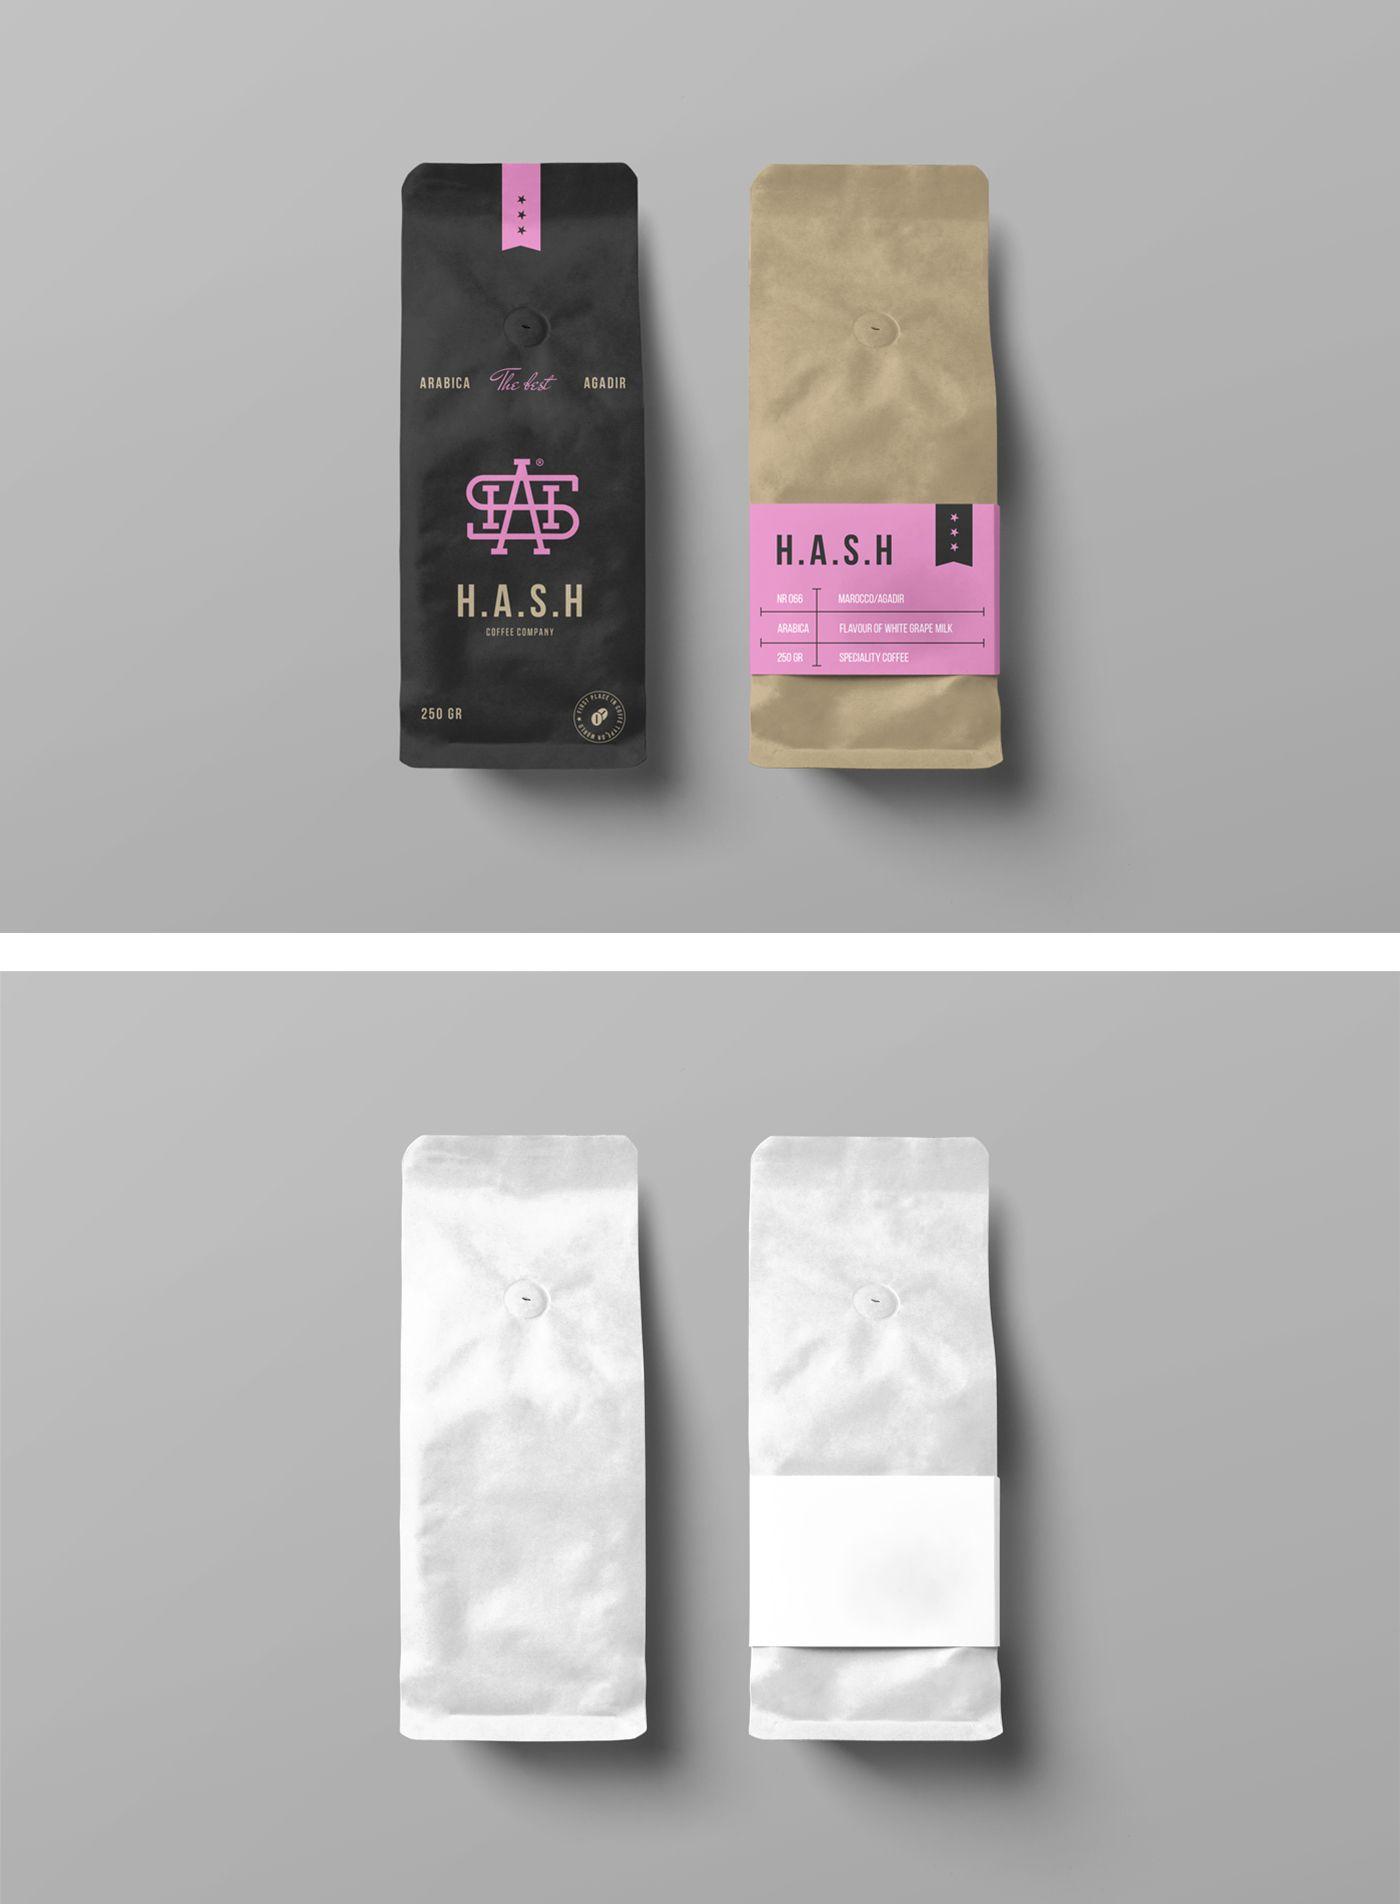 Coffee Bags Mockups Mr Mockup Graphic Design Freebies Bag Mockup Graphic Design Freebies Design Freebie